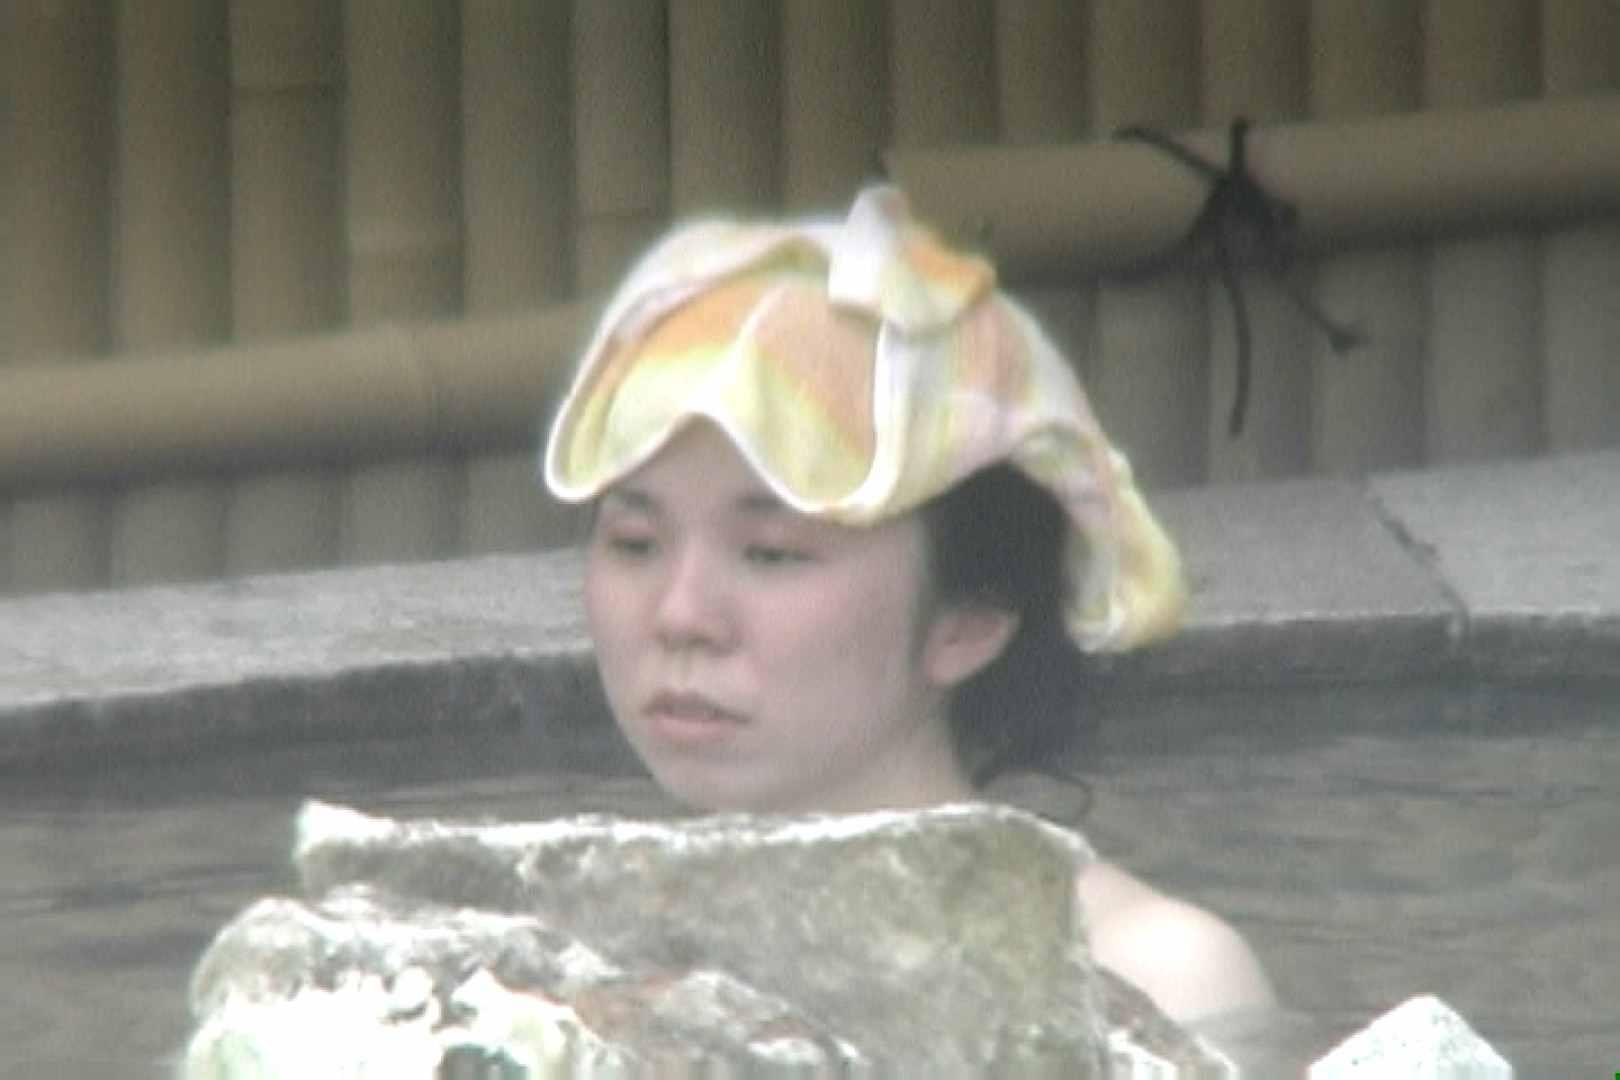 Aquaな露天風呂Vol.687 盗撮シリーズ | 露天風呂編  93PIX 53